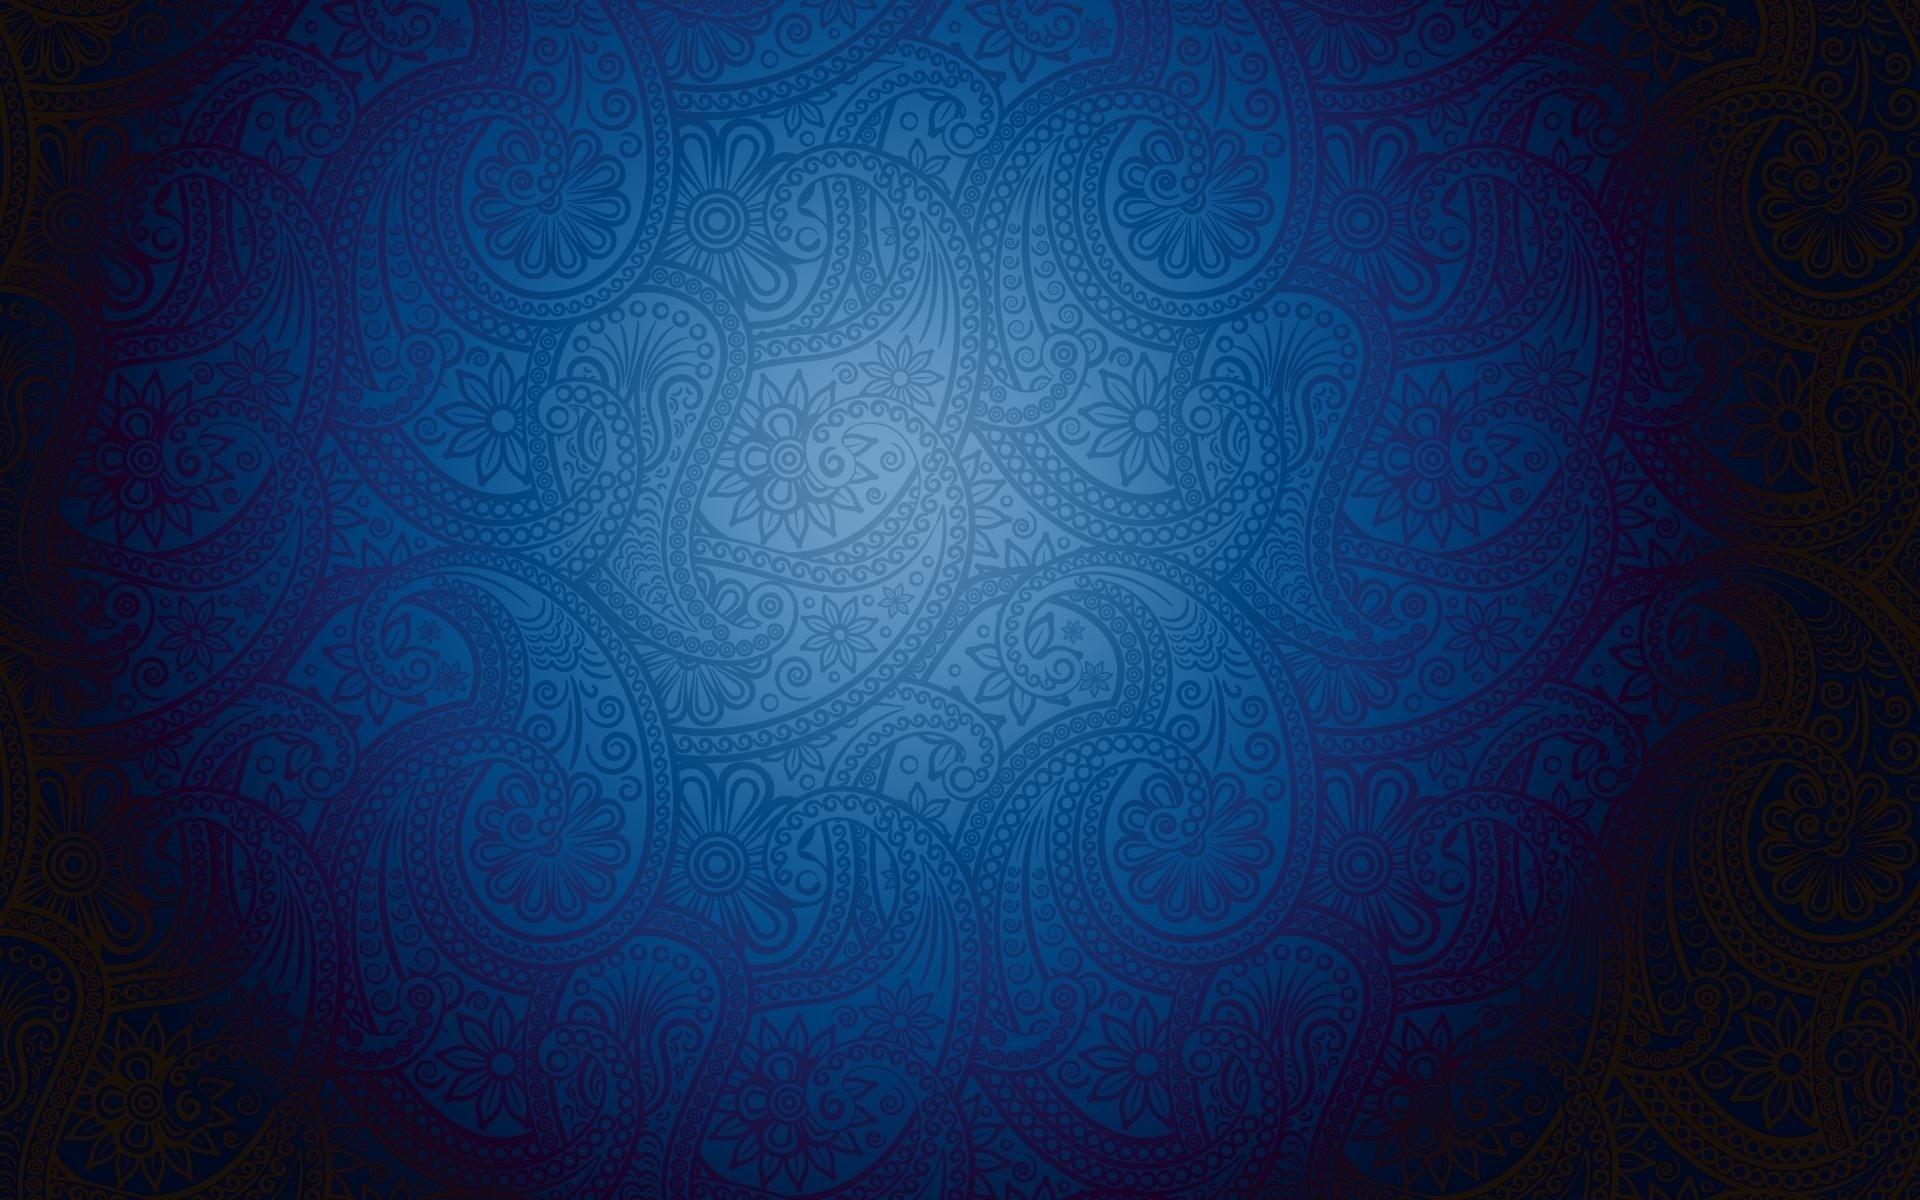 US Navy Backgrounds WallpaperPulse | Wallpapers 4k | Pinterest | Navy  wallpaper and Wallpaper